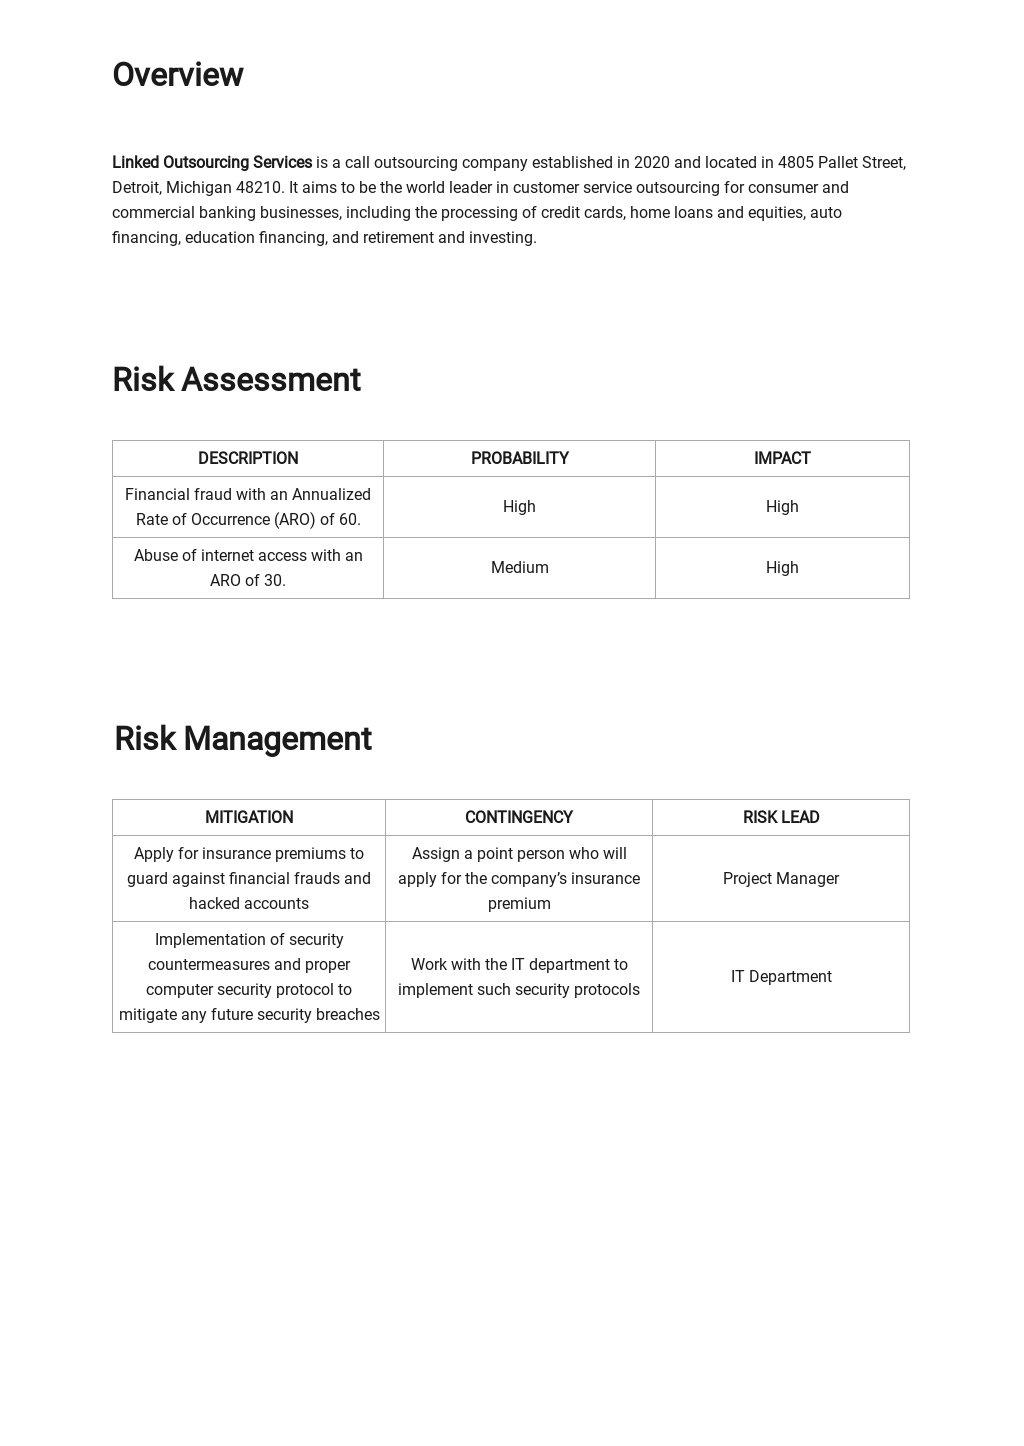 Quantitative Risk Analysis Template 1.jpe